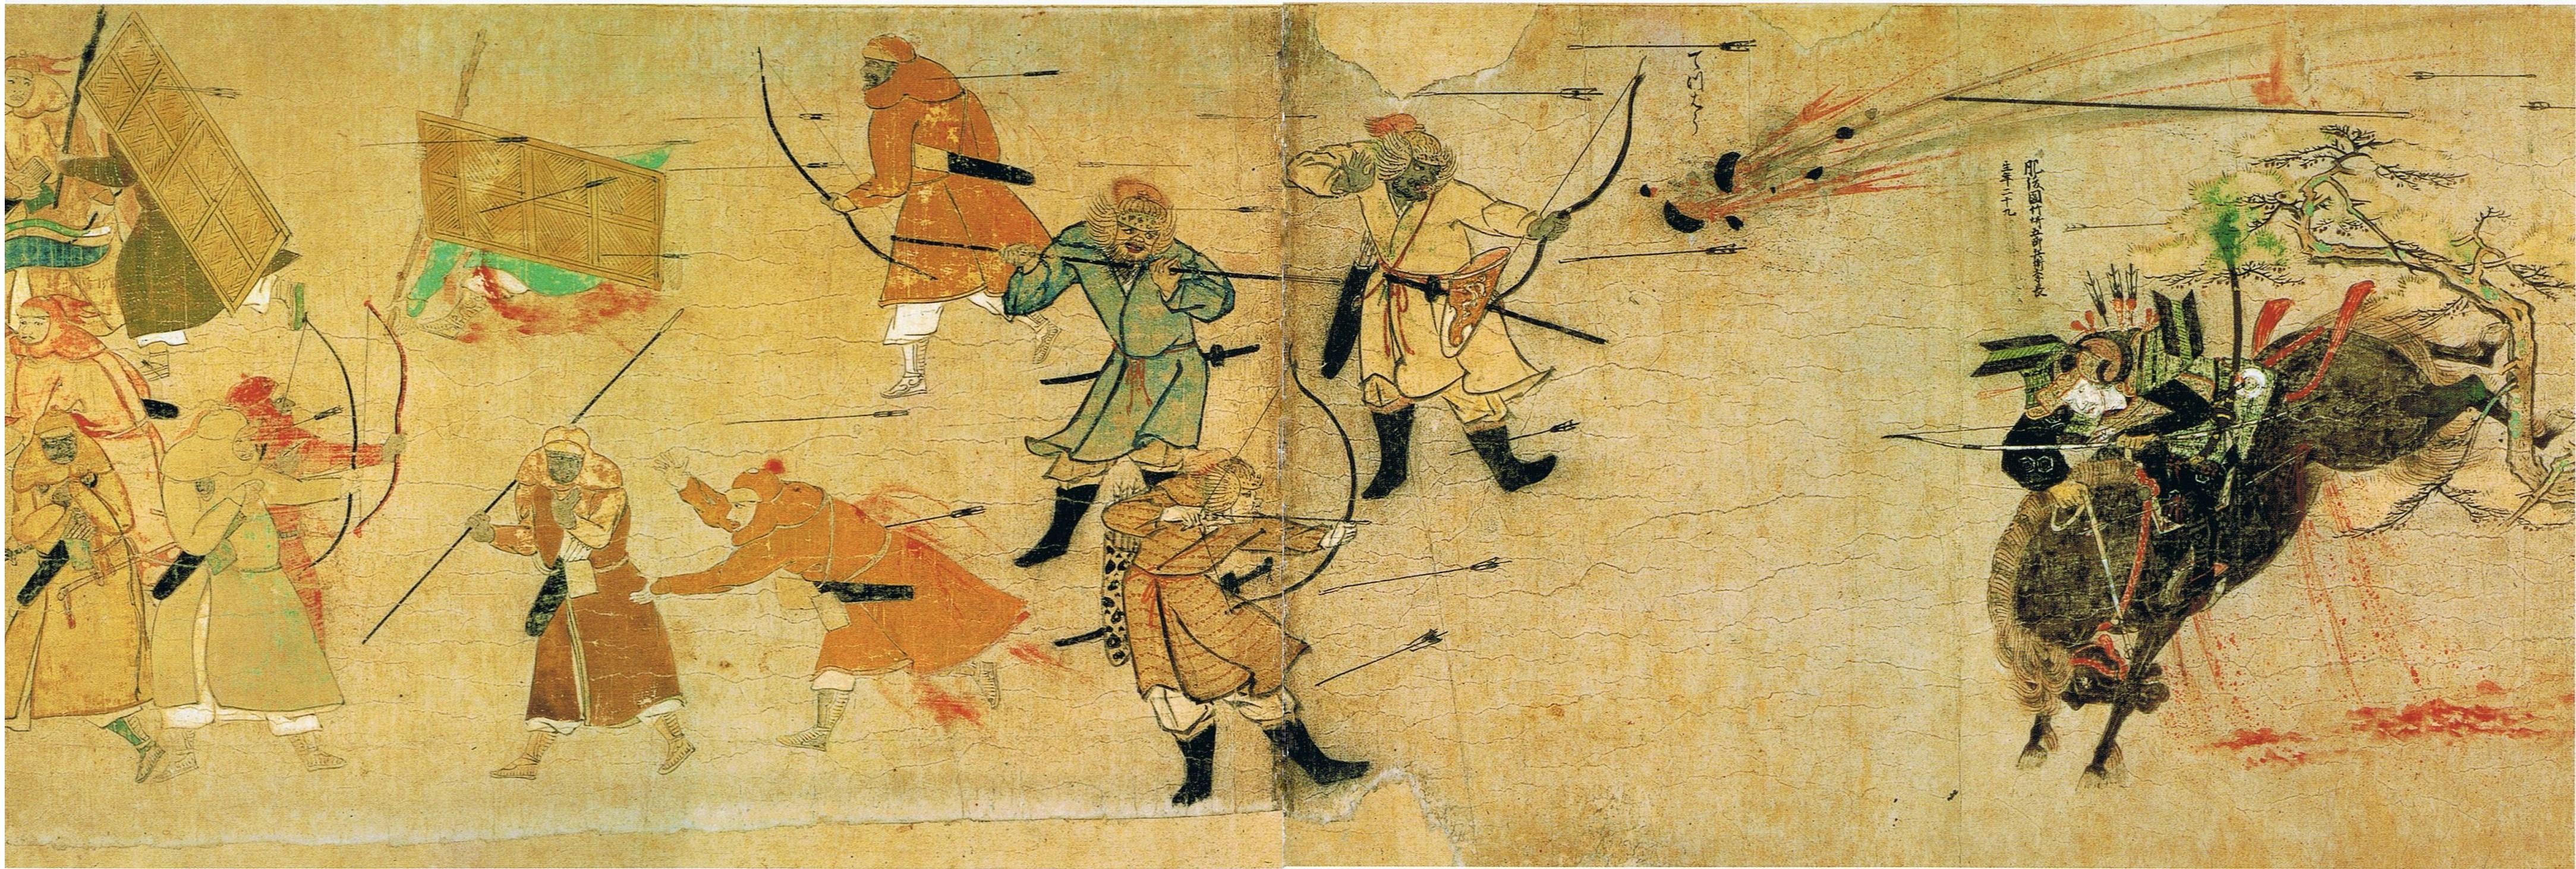 Depiction of the samurai Takezaki Suenaga repelling Mongol and Korean arrows and bombs at Hakata Bay.